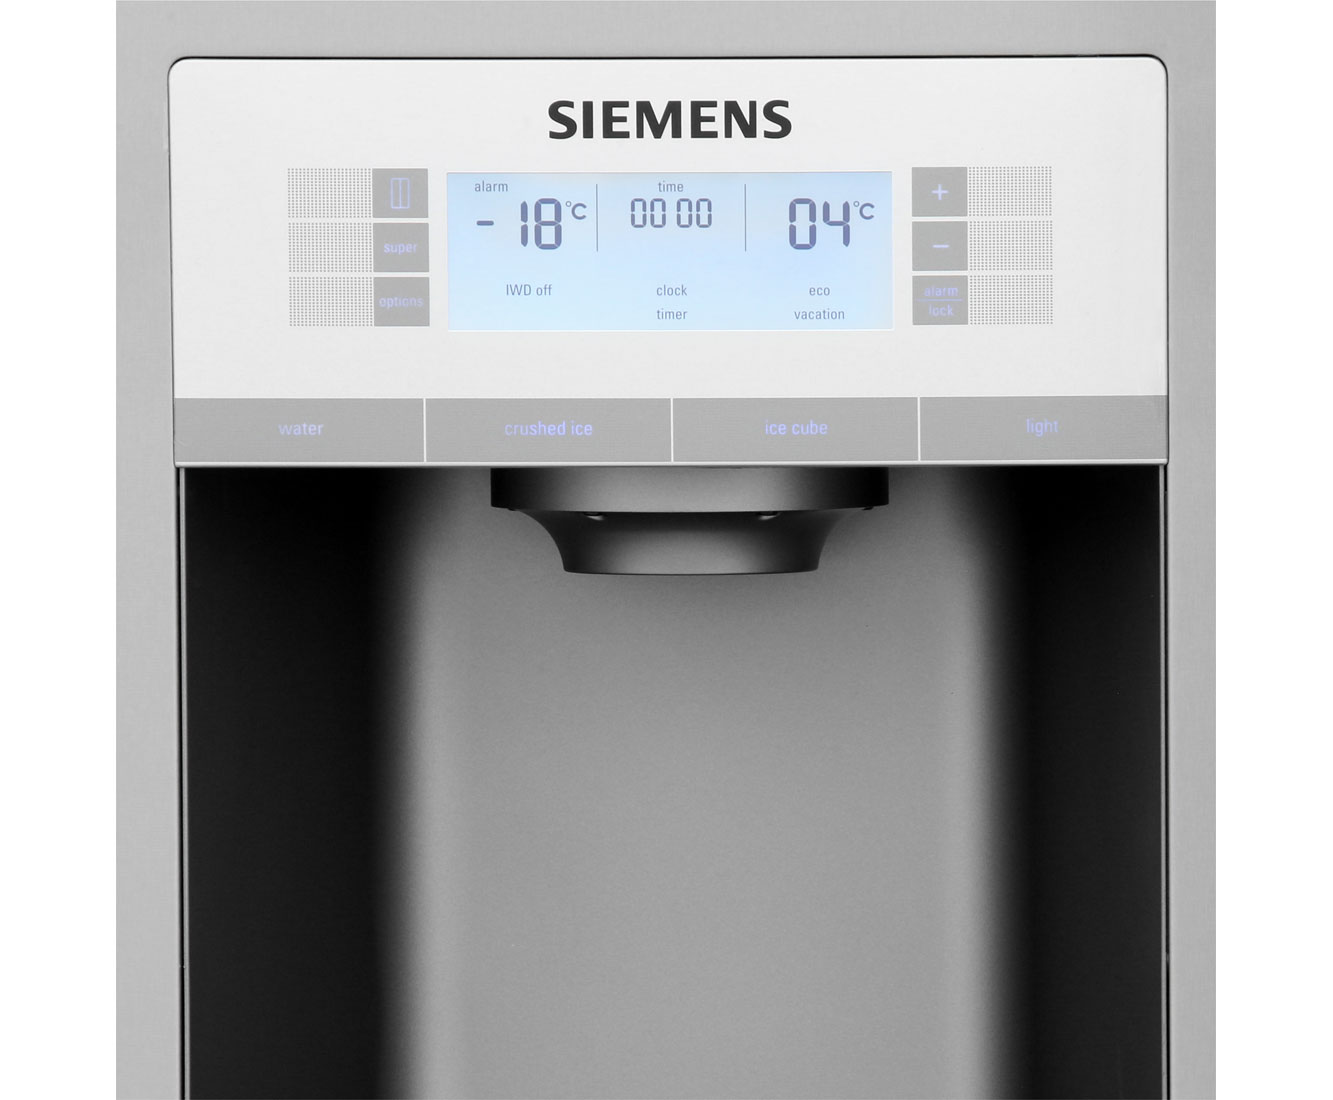 Siemens Kühlschrank Super Knopf : Siemens kühlschrank super knopf tefal knopf cs bauknecht knopf